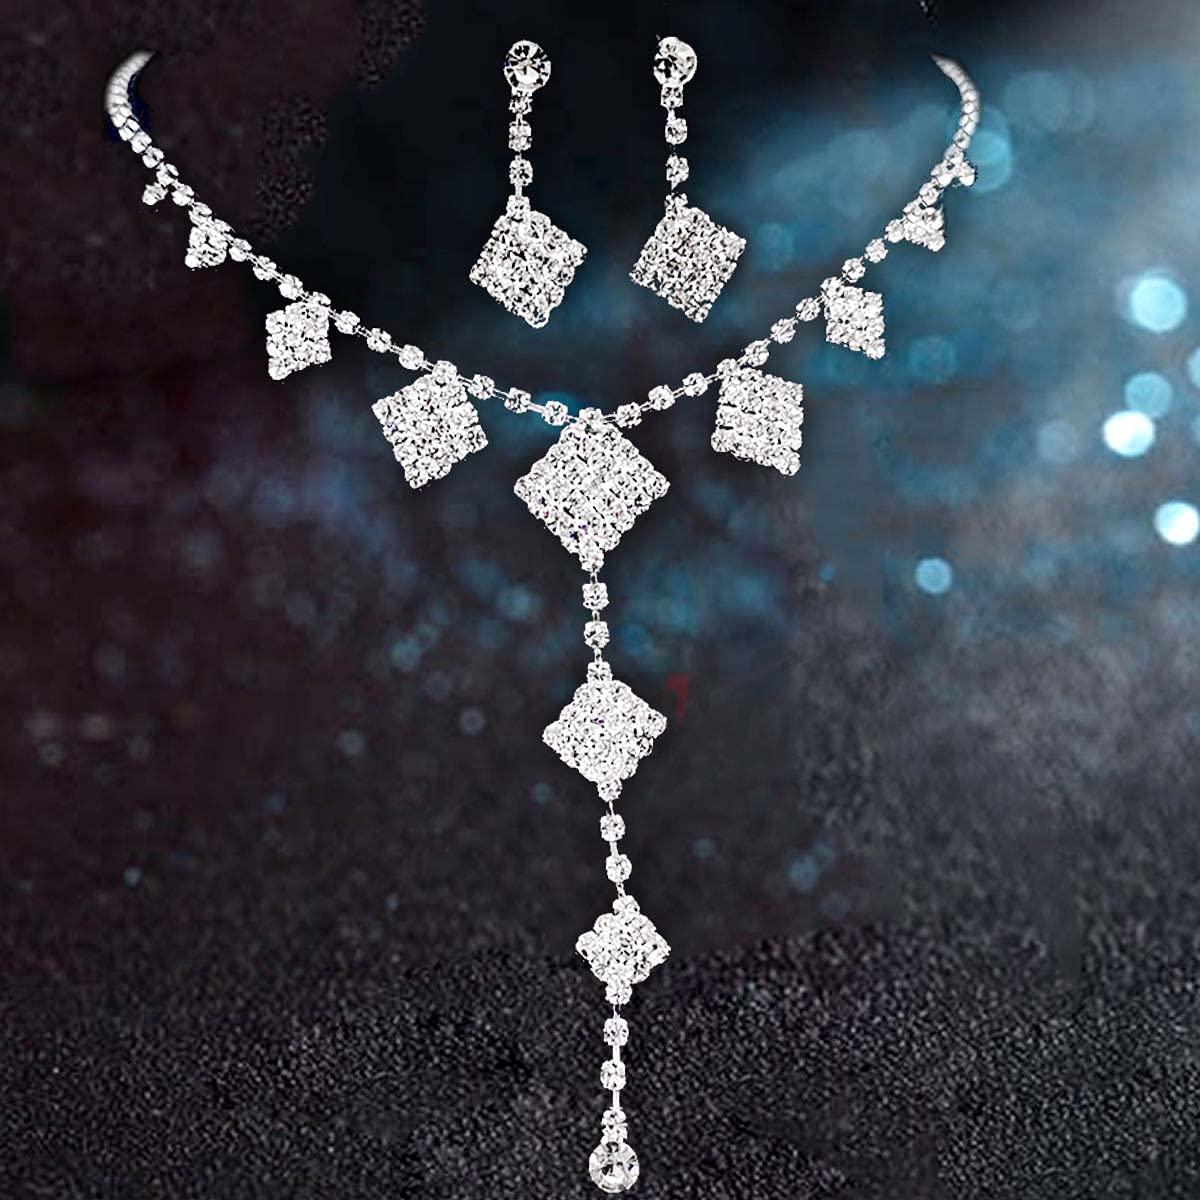 Shehamdy Elegant Bridesmaid Bridal Jewelry Set Bling Rhinestone Crystal NECKLACE+EARRINGS SET Women Wedding Party Jewelry Sets (Set -H)